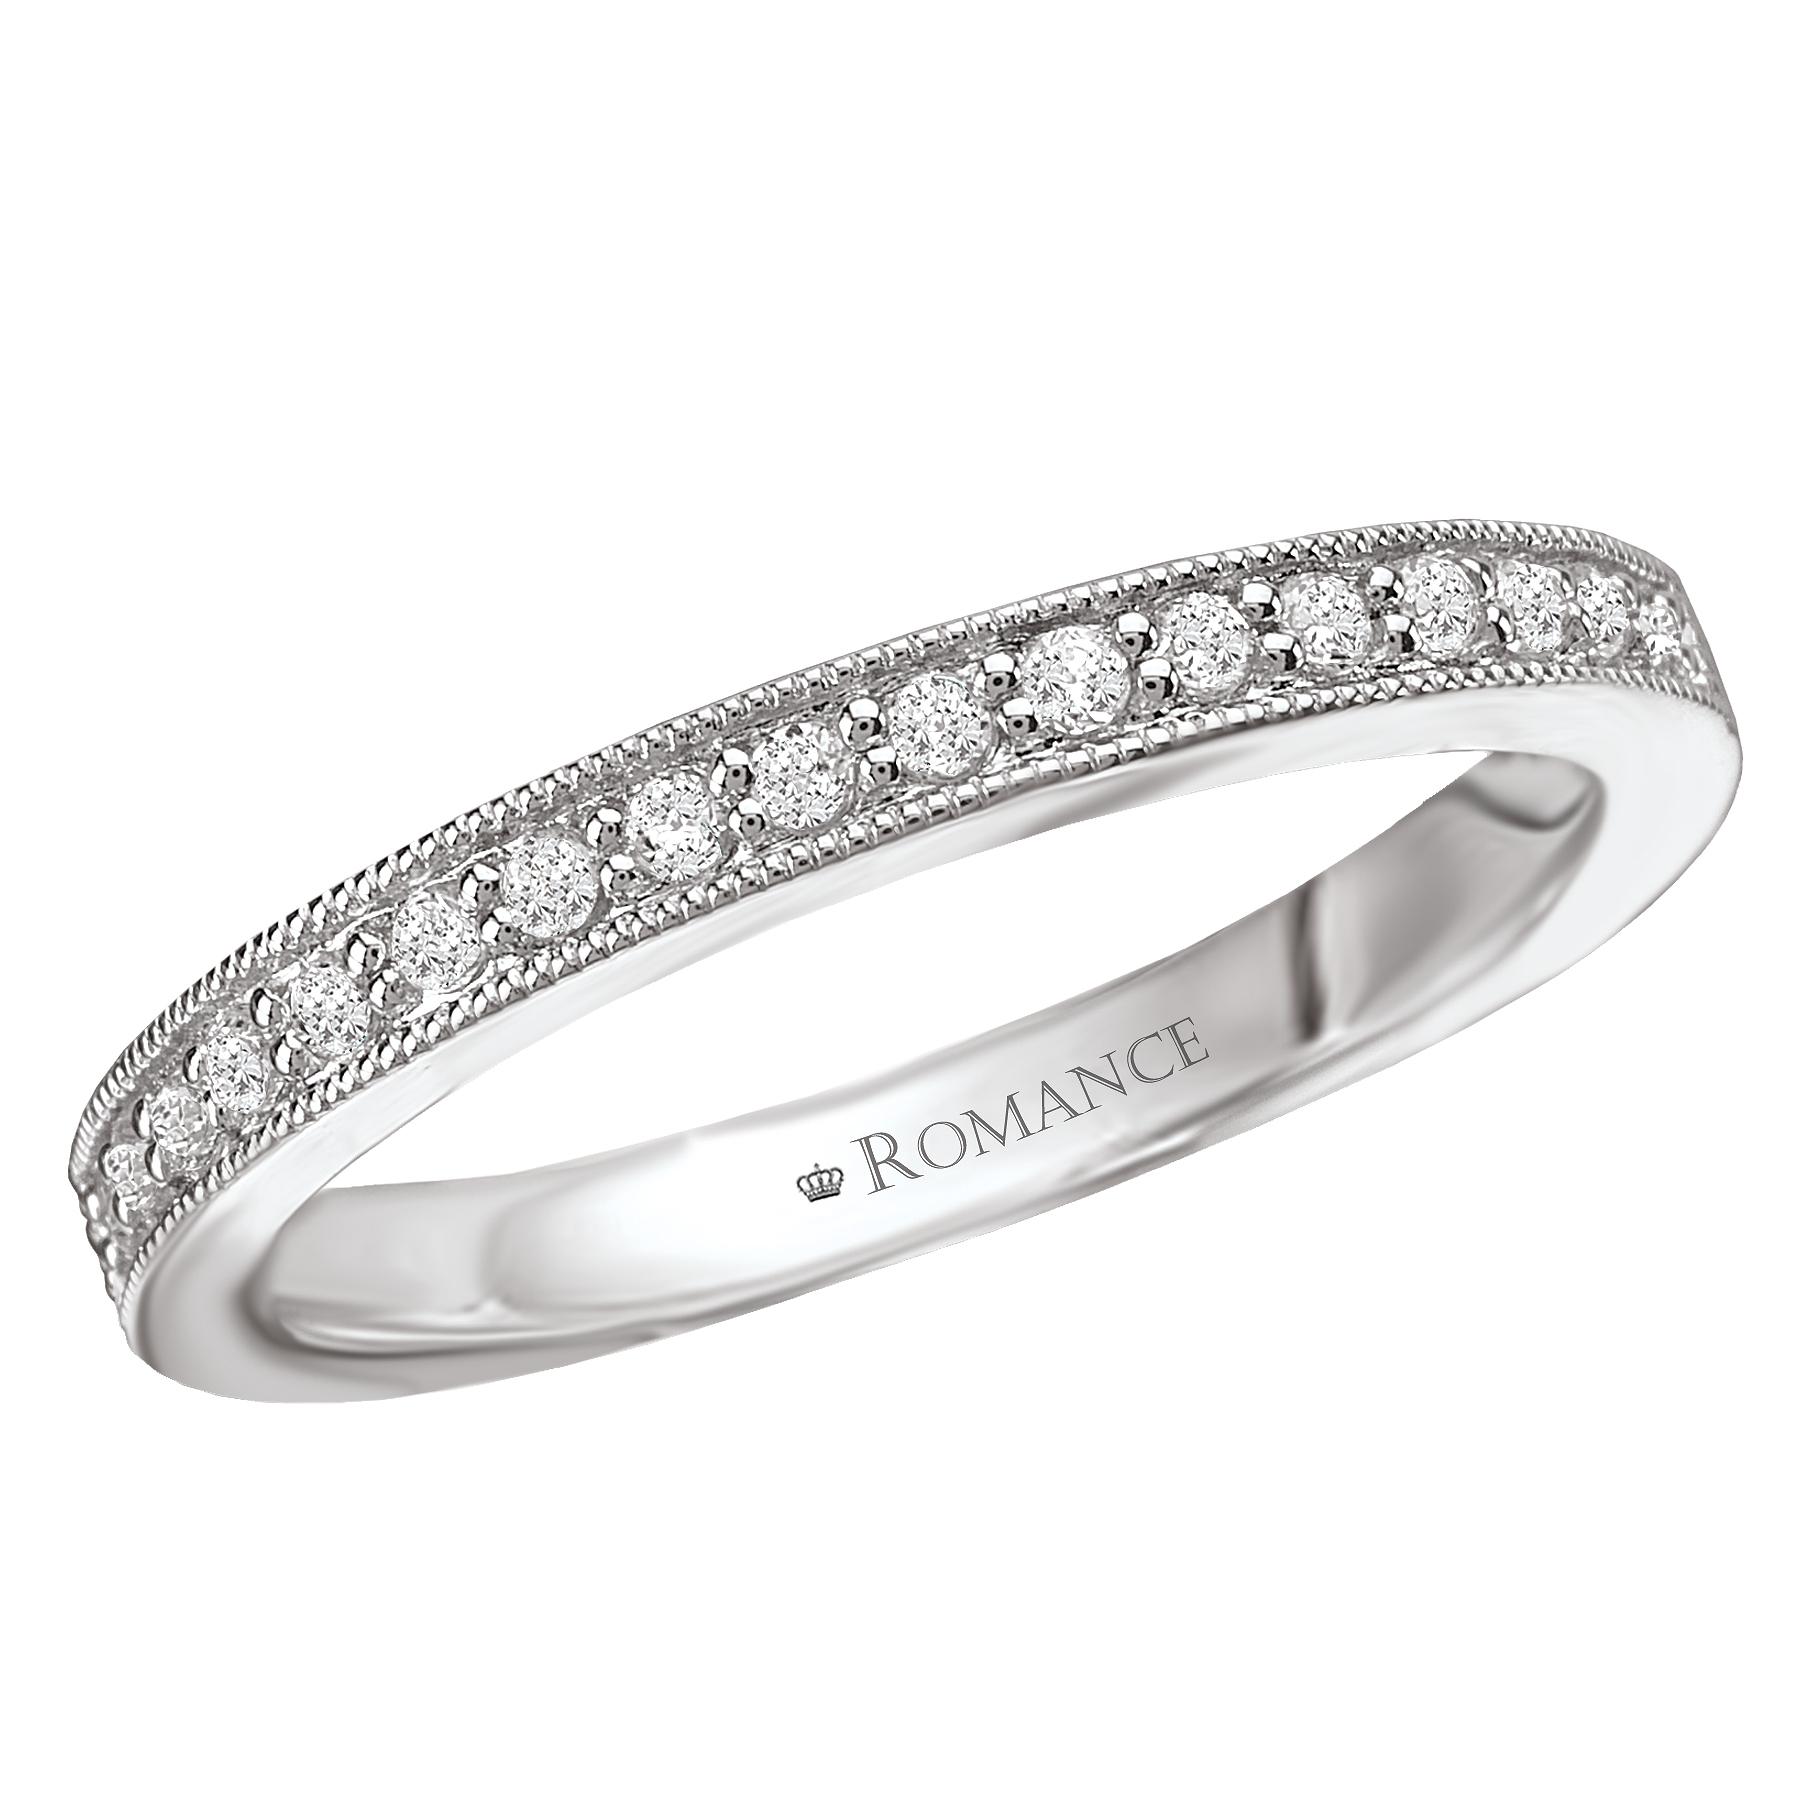 Romantic Bands: Romance Wedding Bands 117065-W